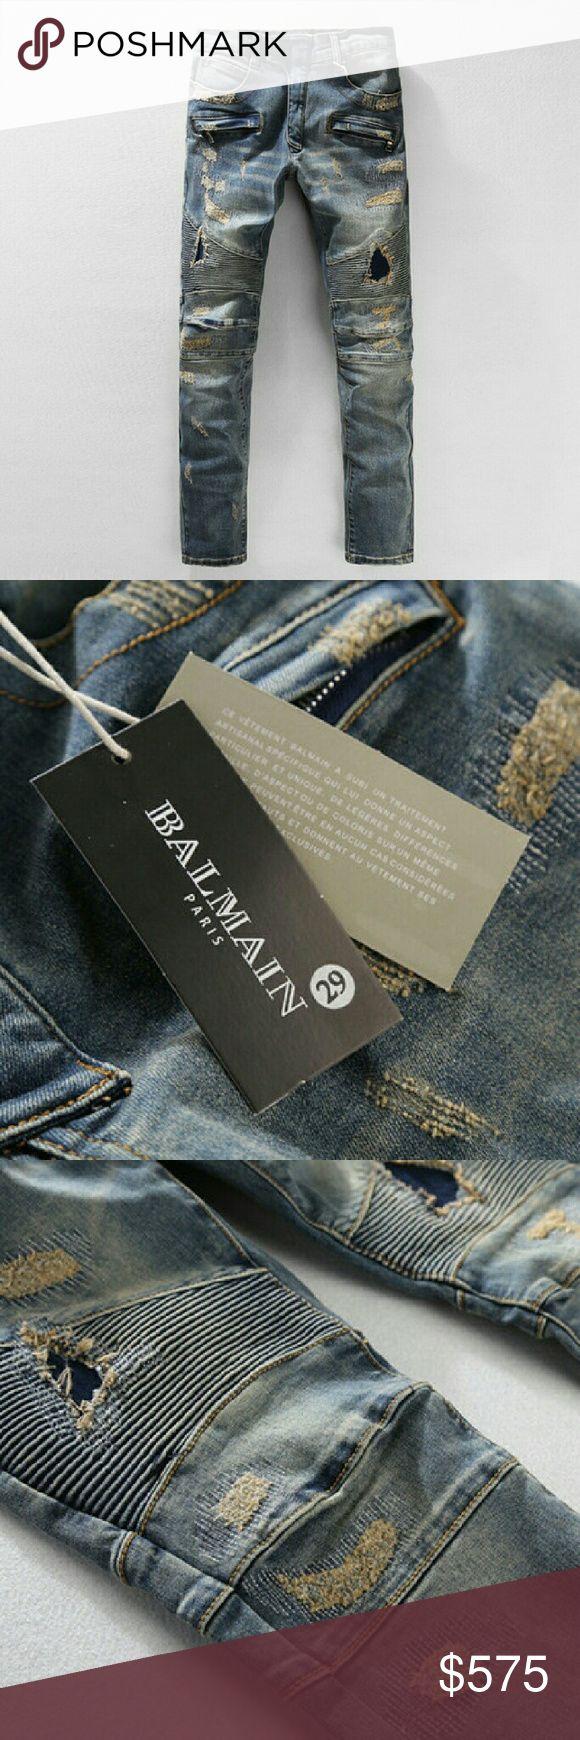 Balmain Jeans men Design your closet in style Balmain Jeans Slim Straight